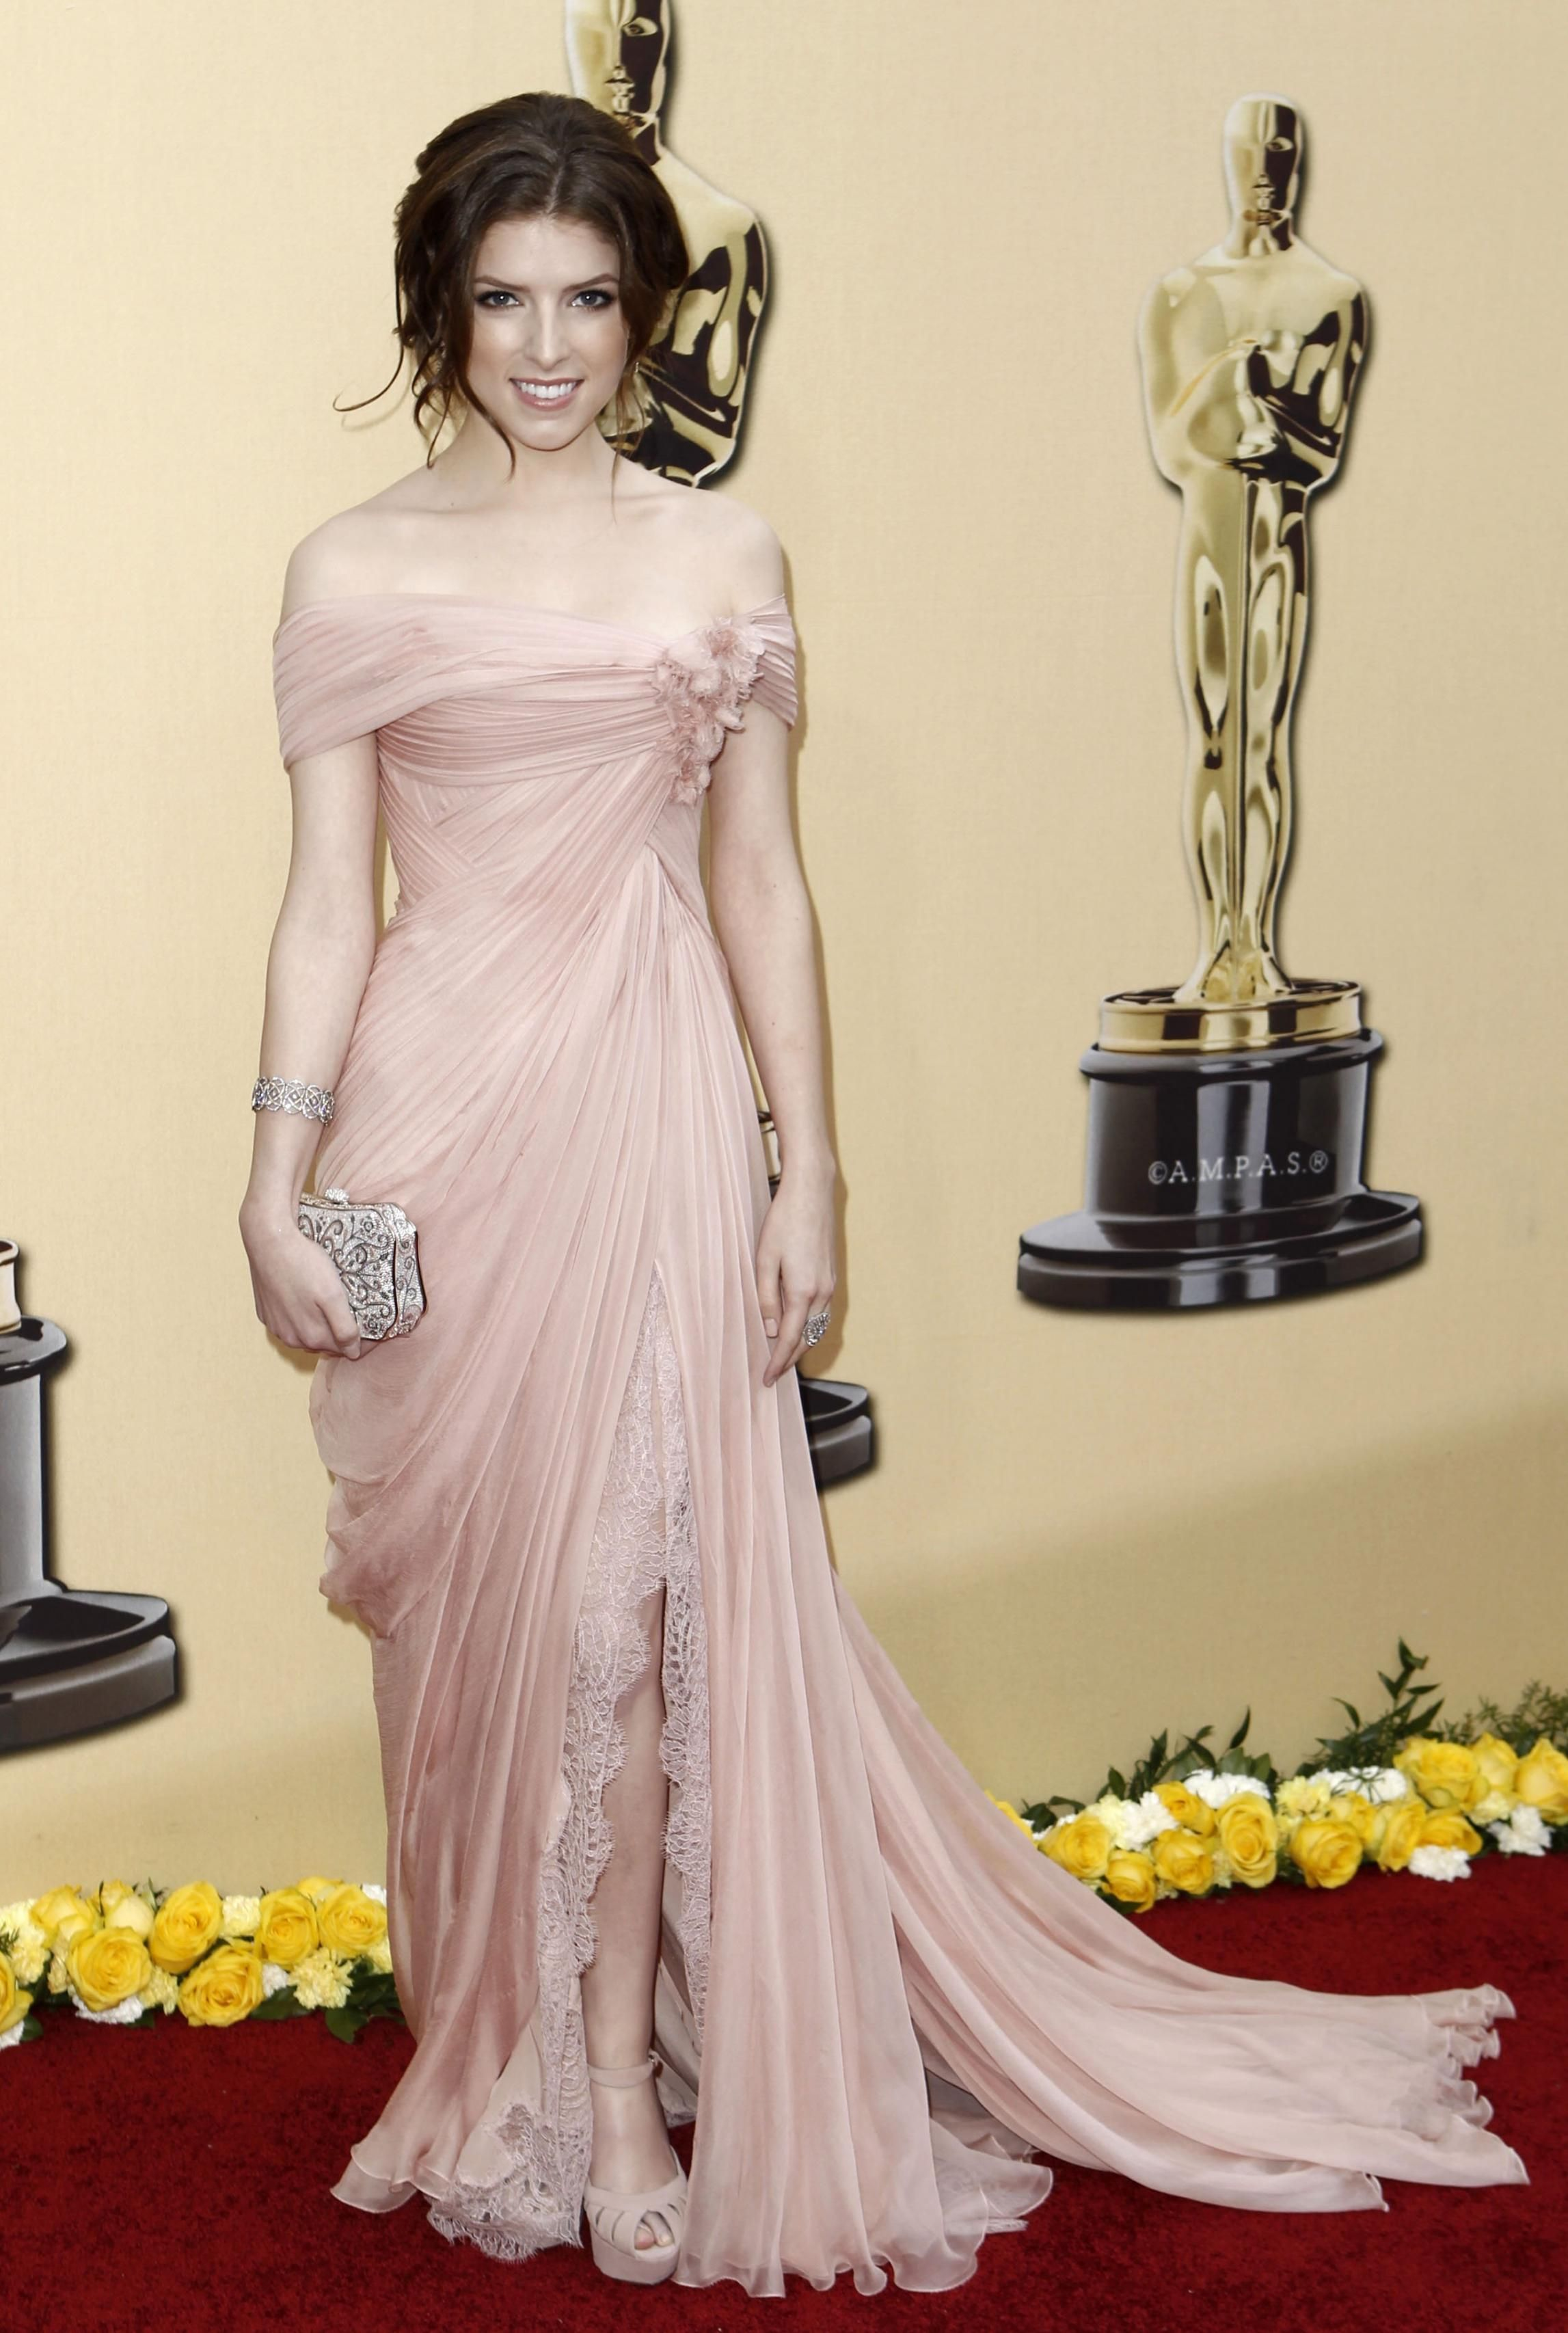 Mila kunis wedding dress  Cher is back on the charts with uWomanus Worldu  Anna kendrick